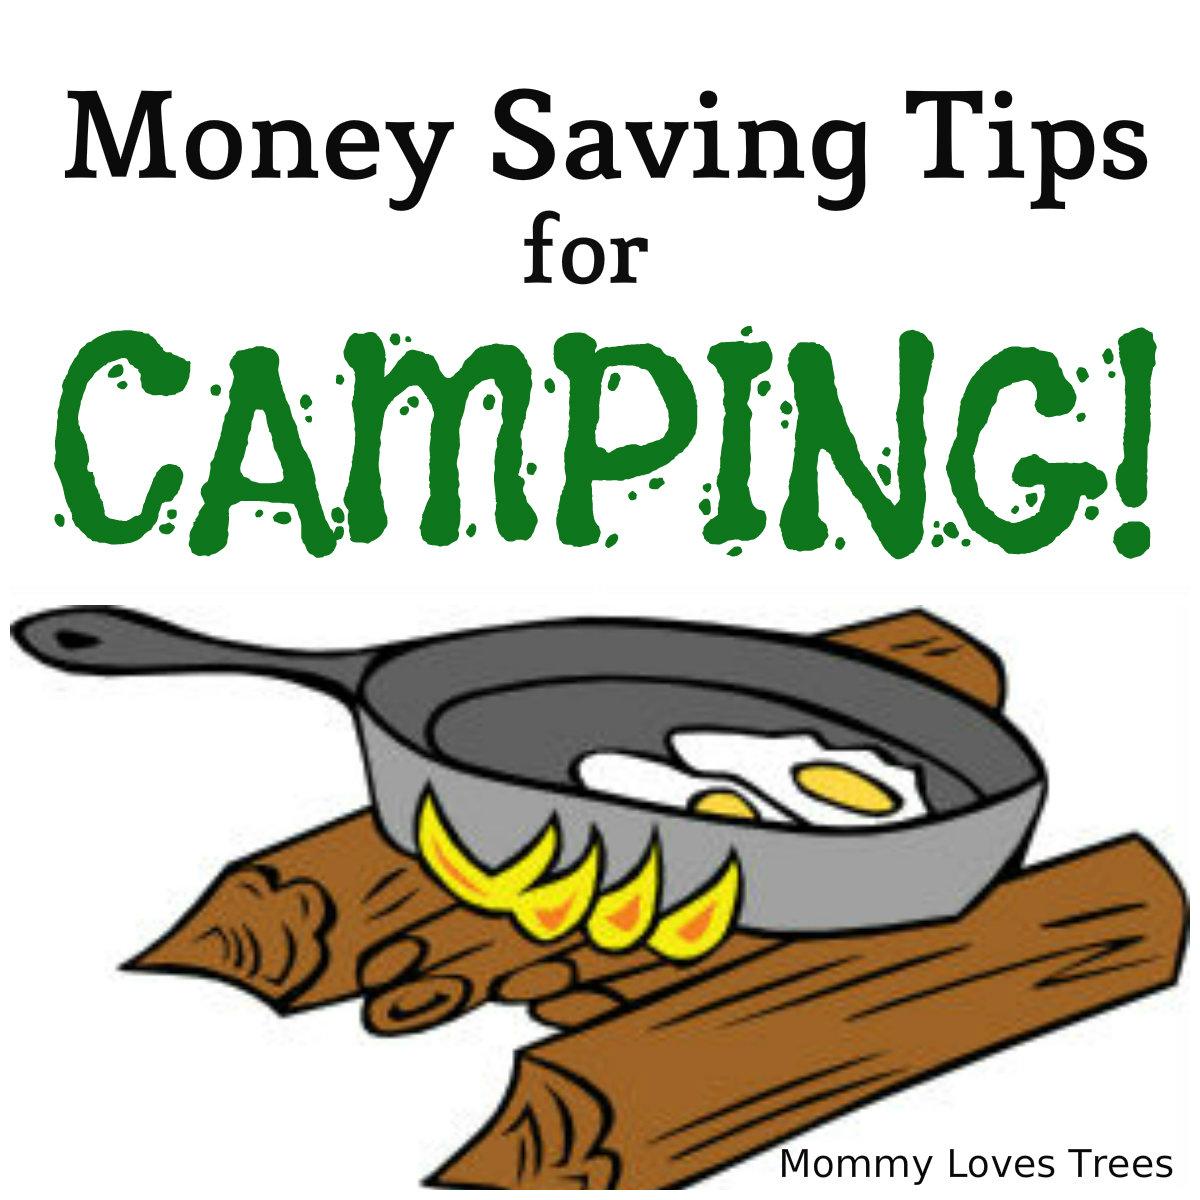 Money saving tips for car camping.